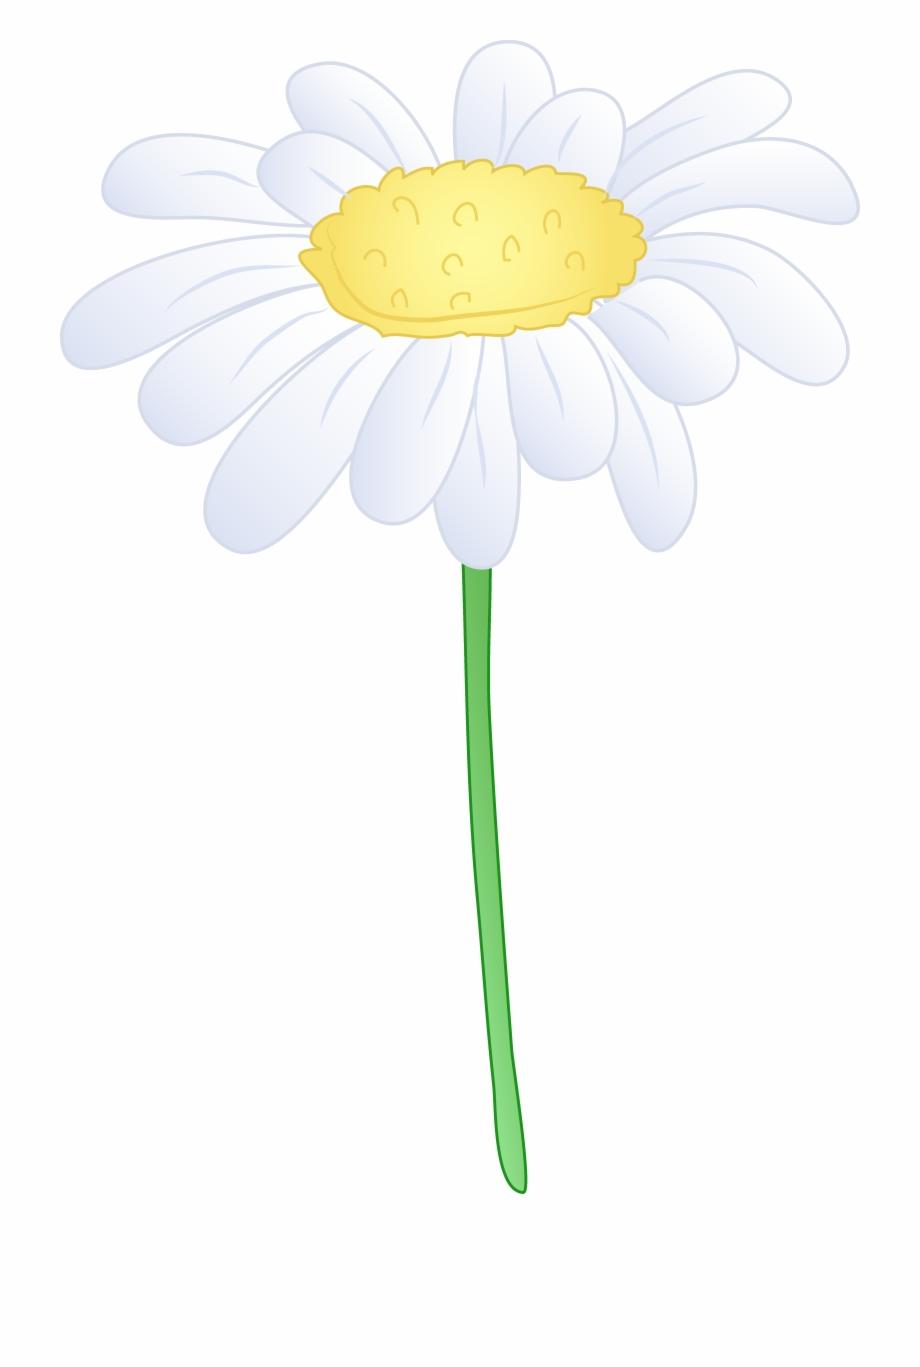 Daisies clipart flowering plant. Single white daisy flower